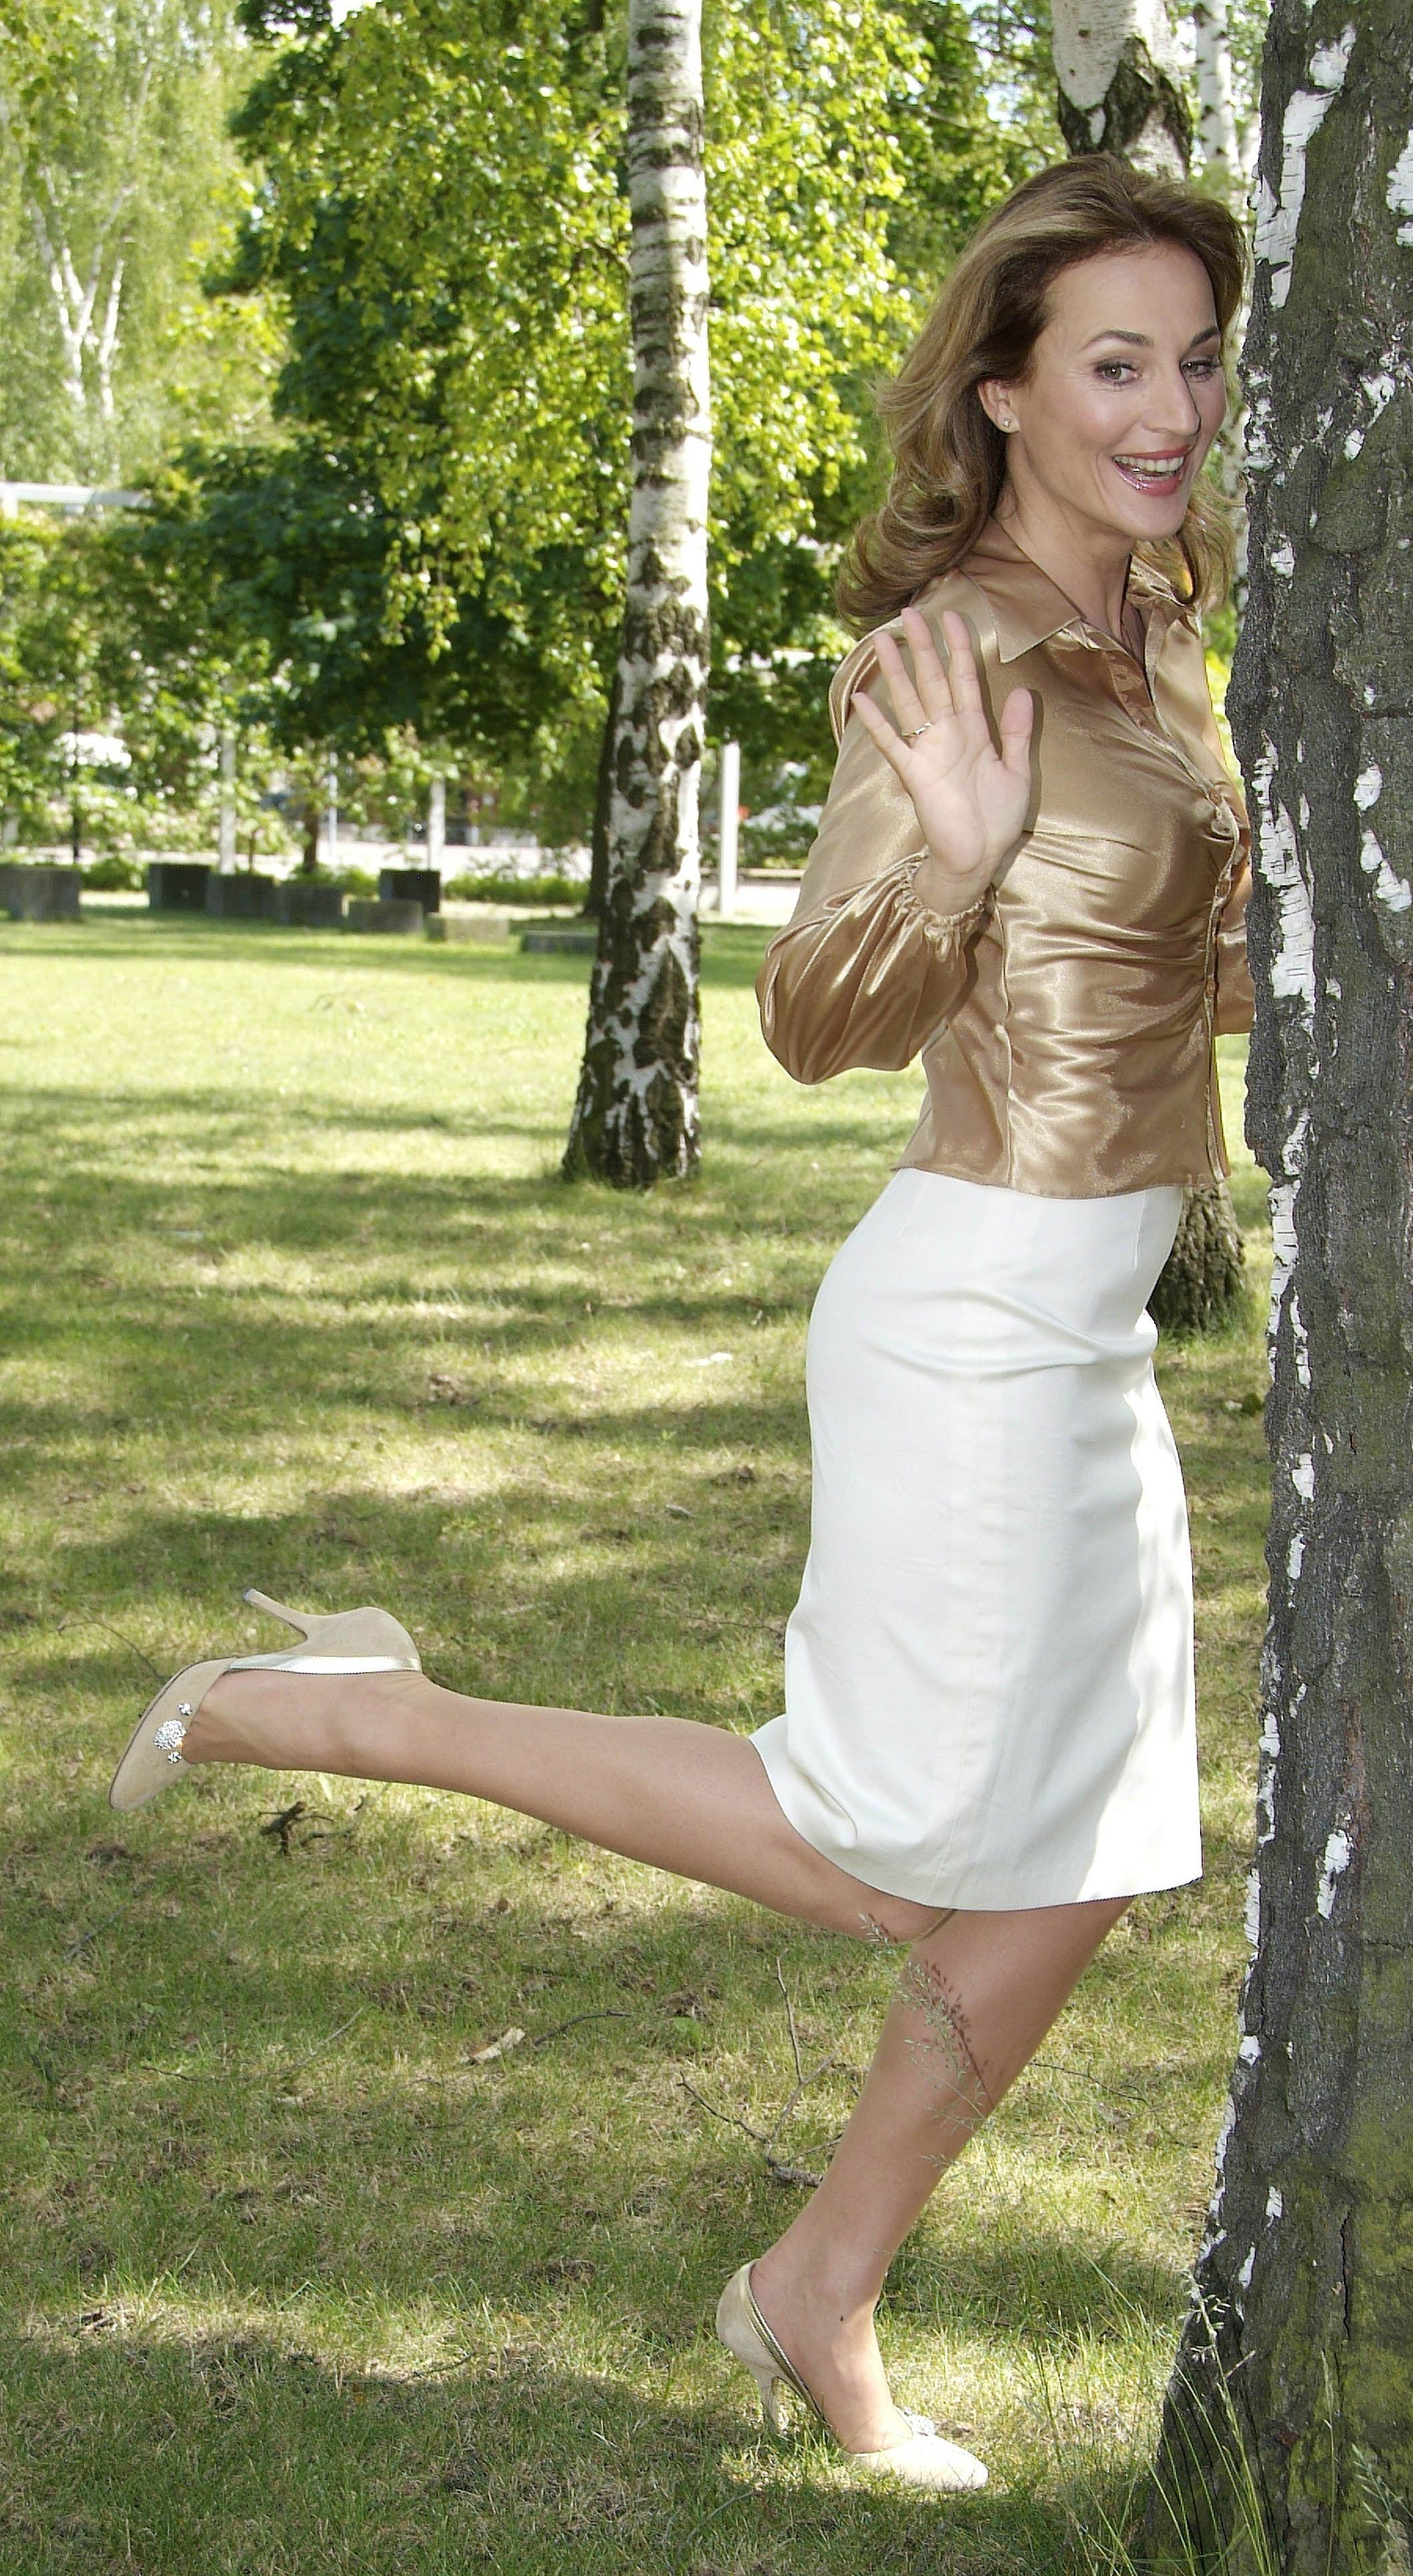 Pin by Dirk Bollmann on CAROLINE BEIL   Mini skirts